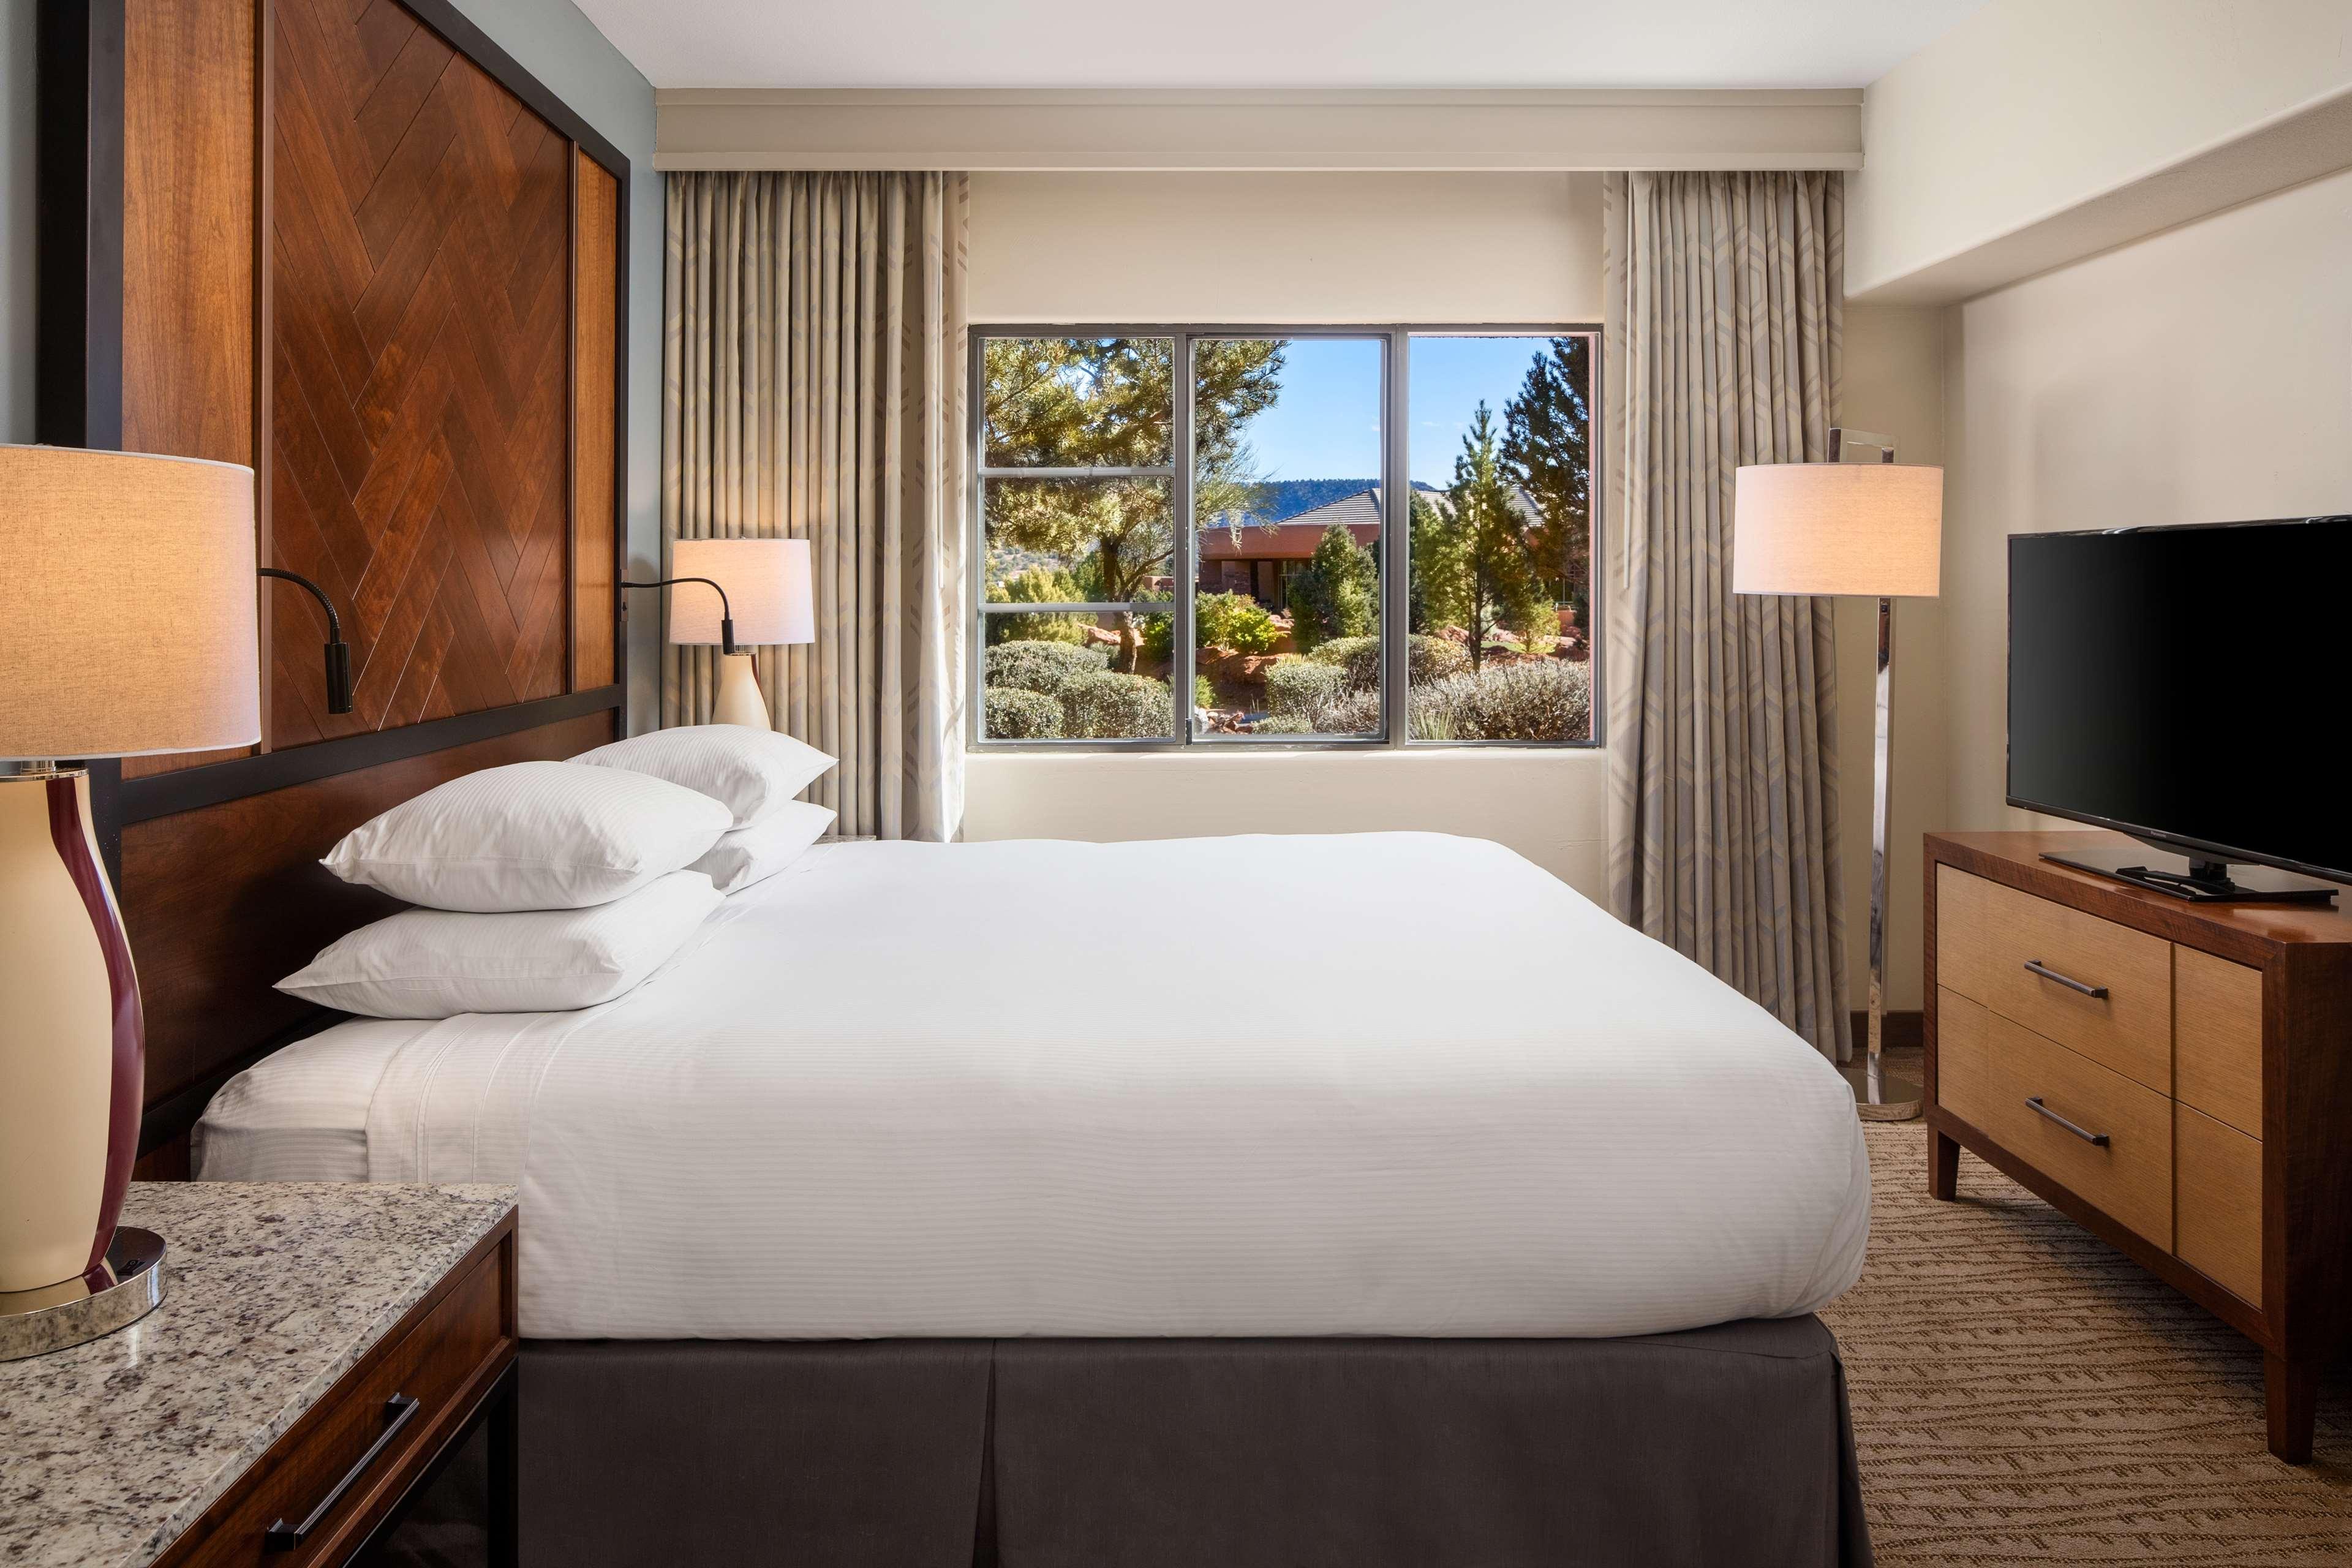 Hilton Sedona Resort at Bell Rock image 49